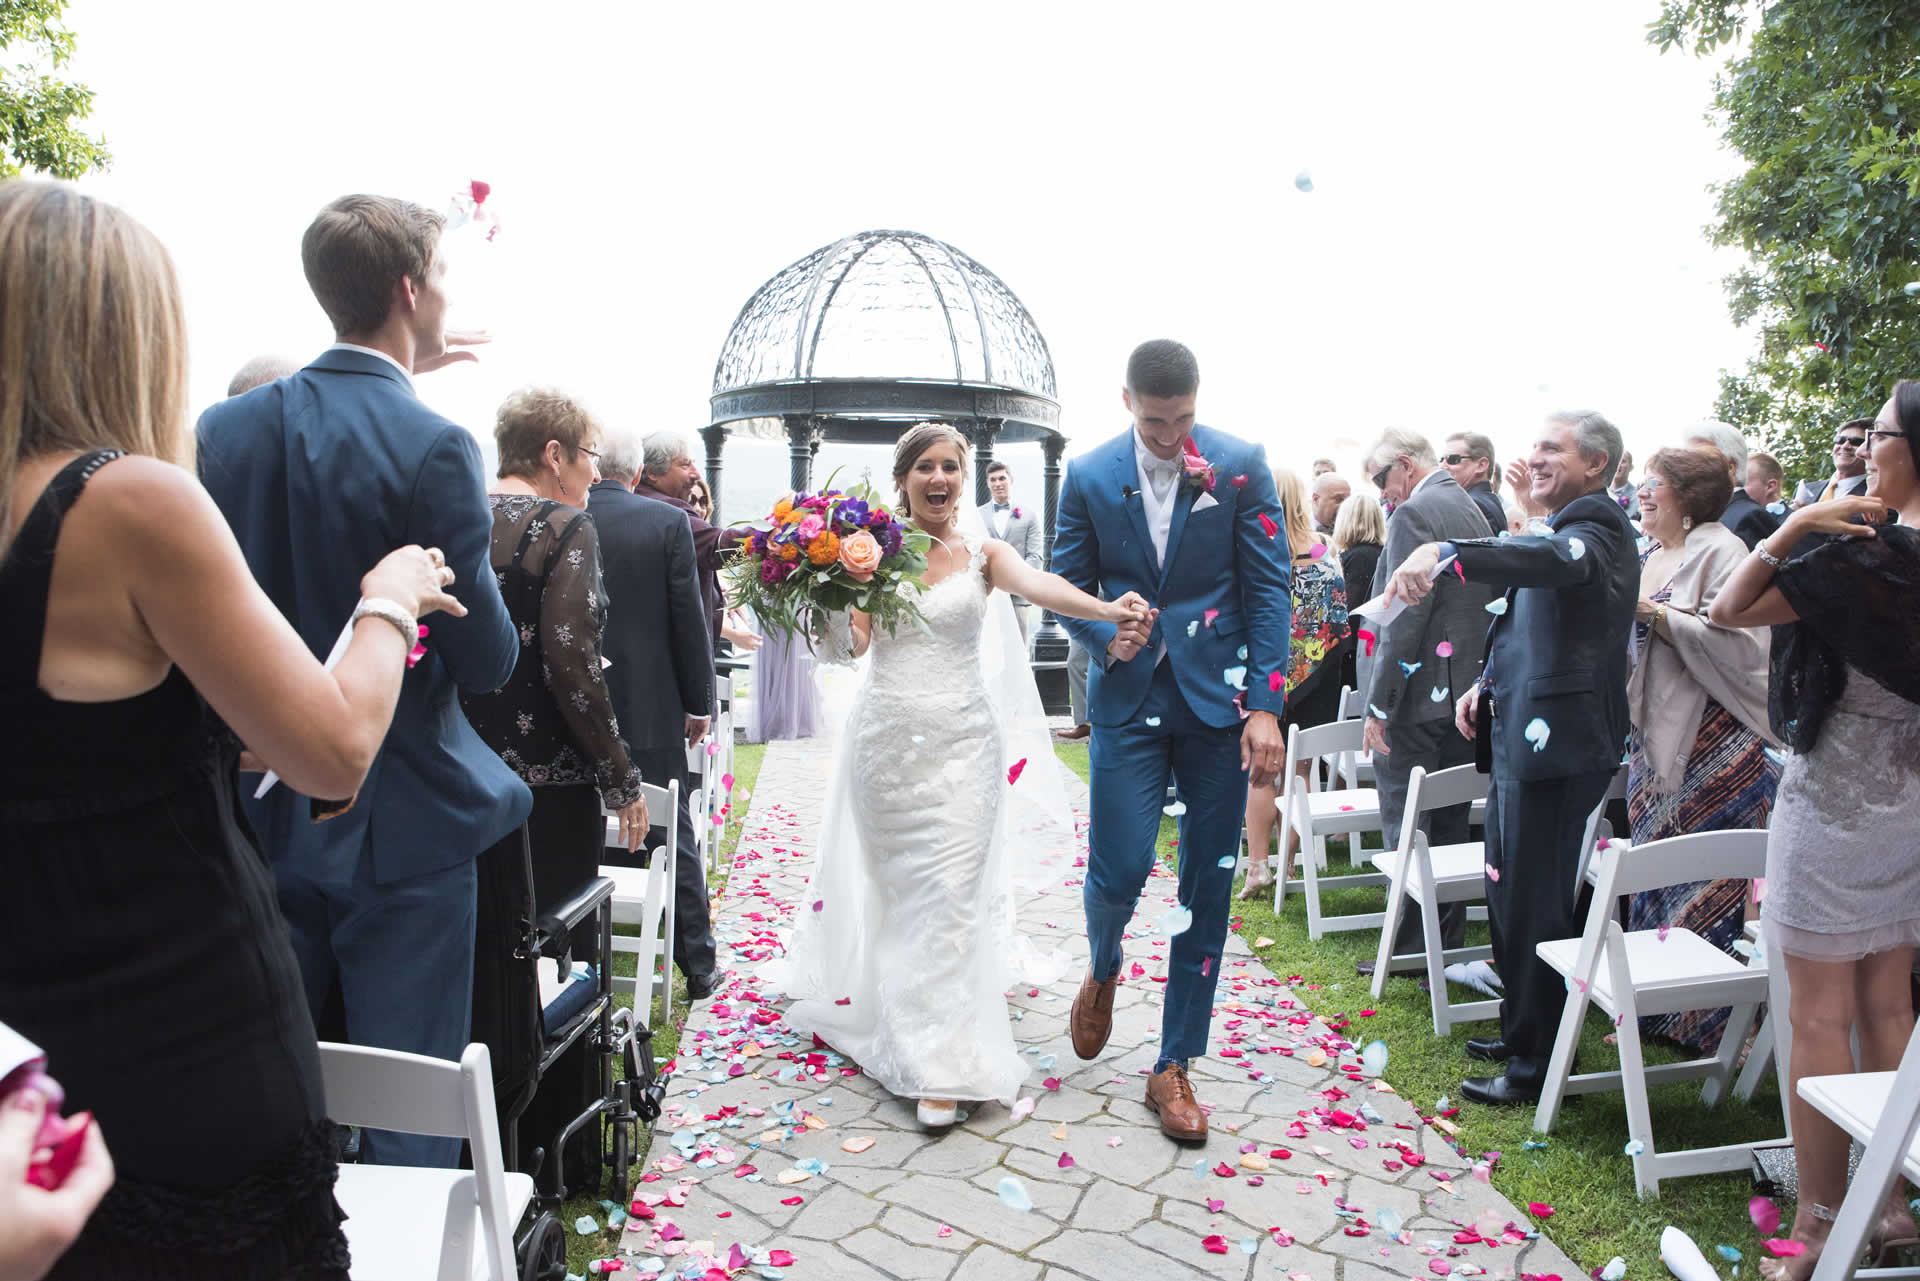 Happy wedding couple happily married at Ridgecrest venue